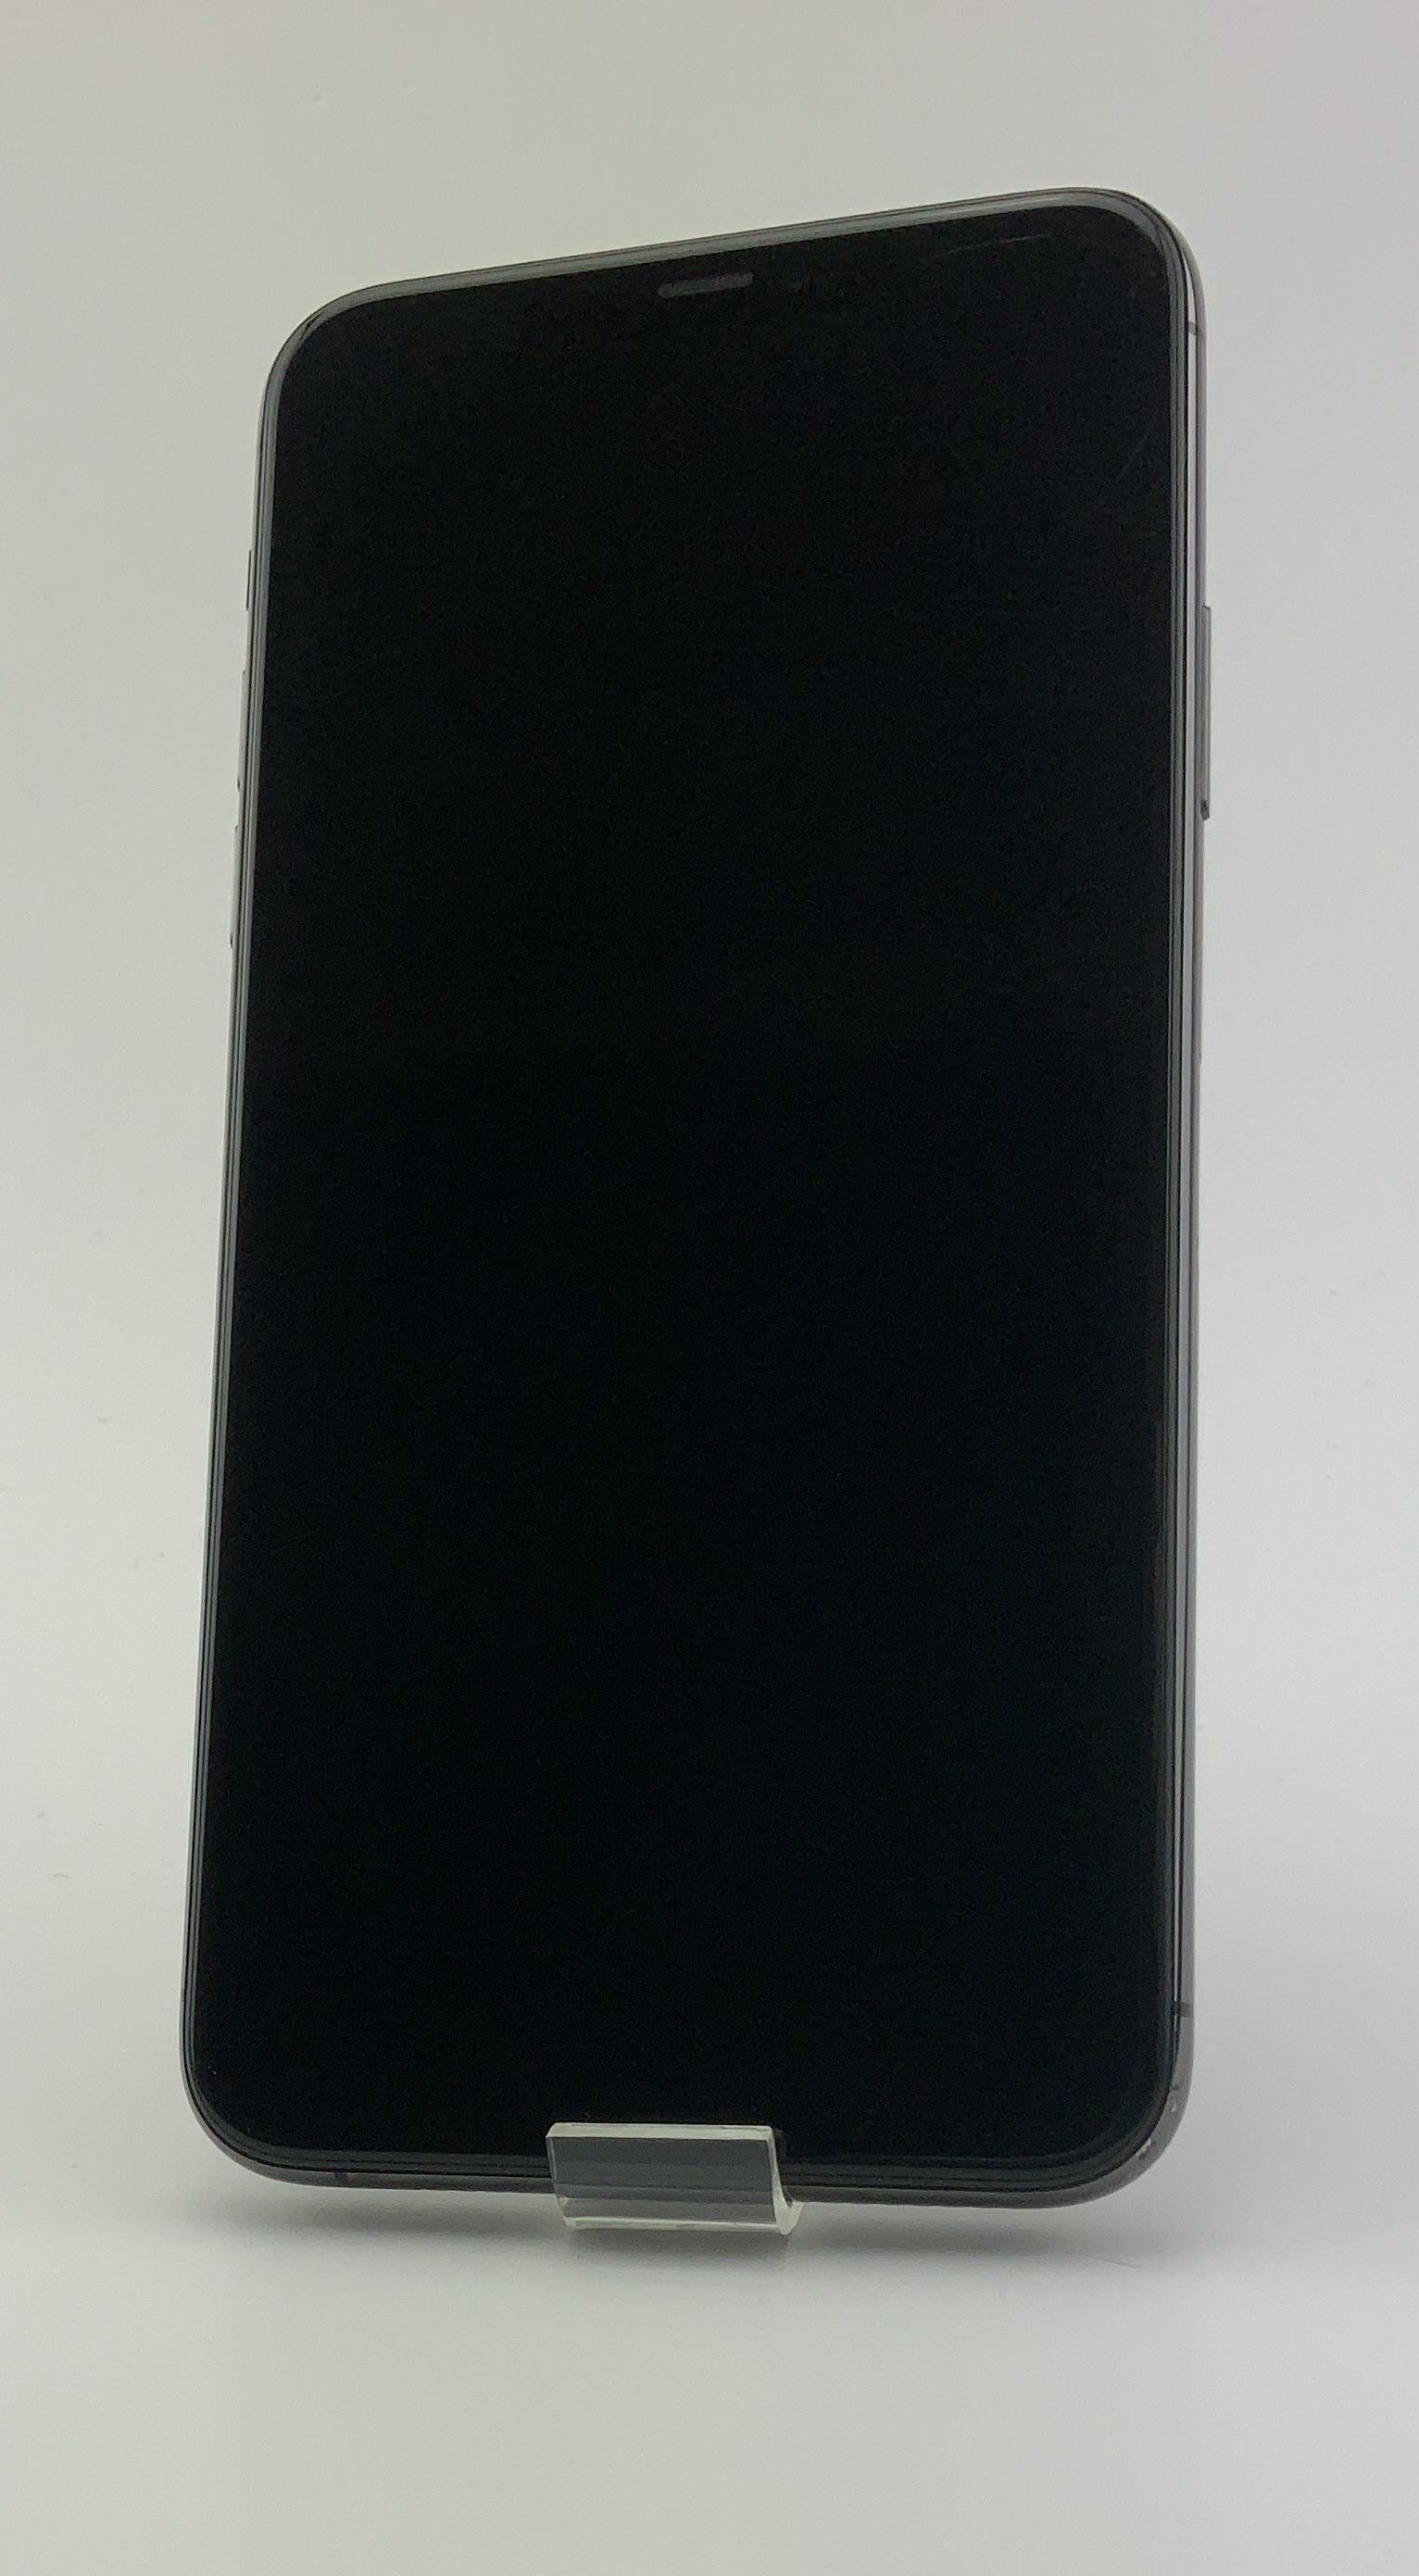 iPhone 11 Pro Max 512GB, 512GB, Space Gray, bild 1